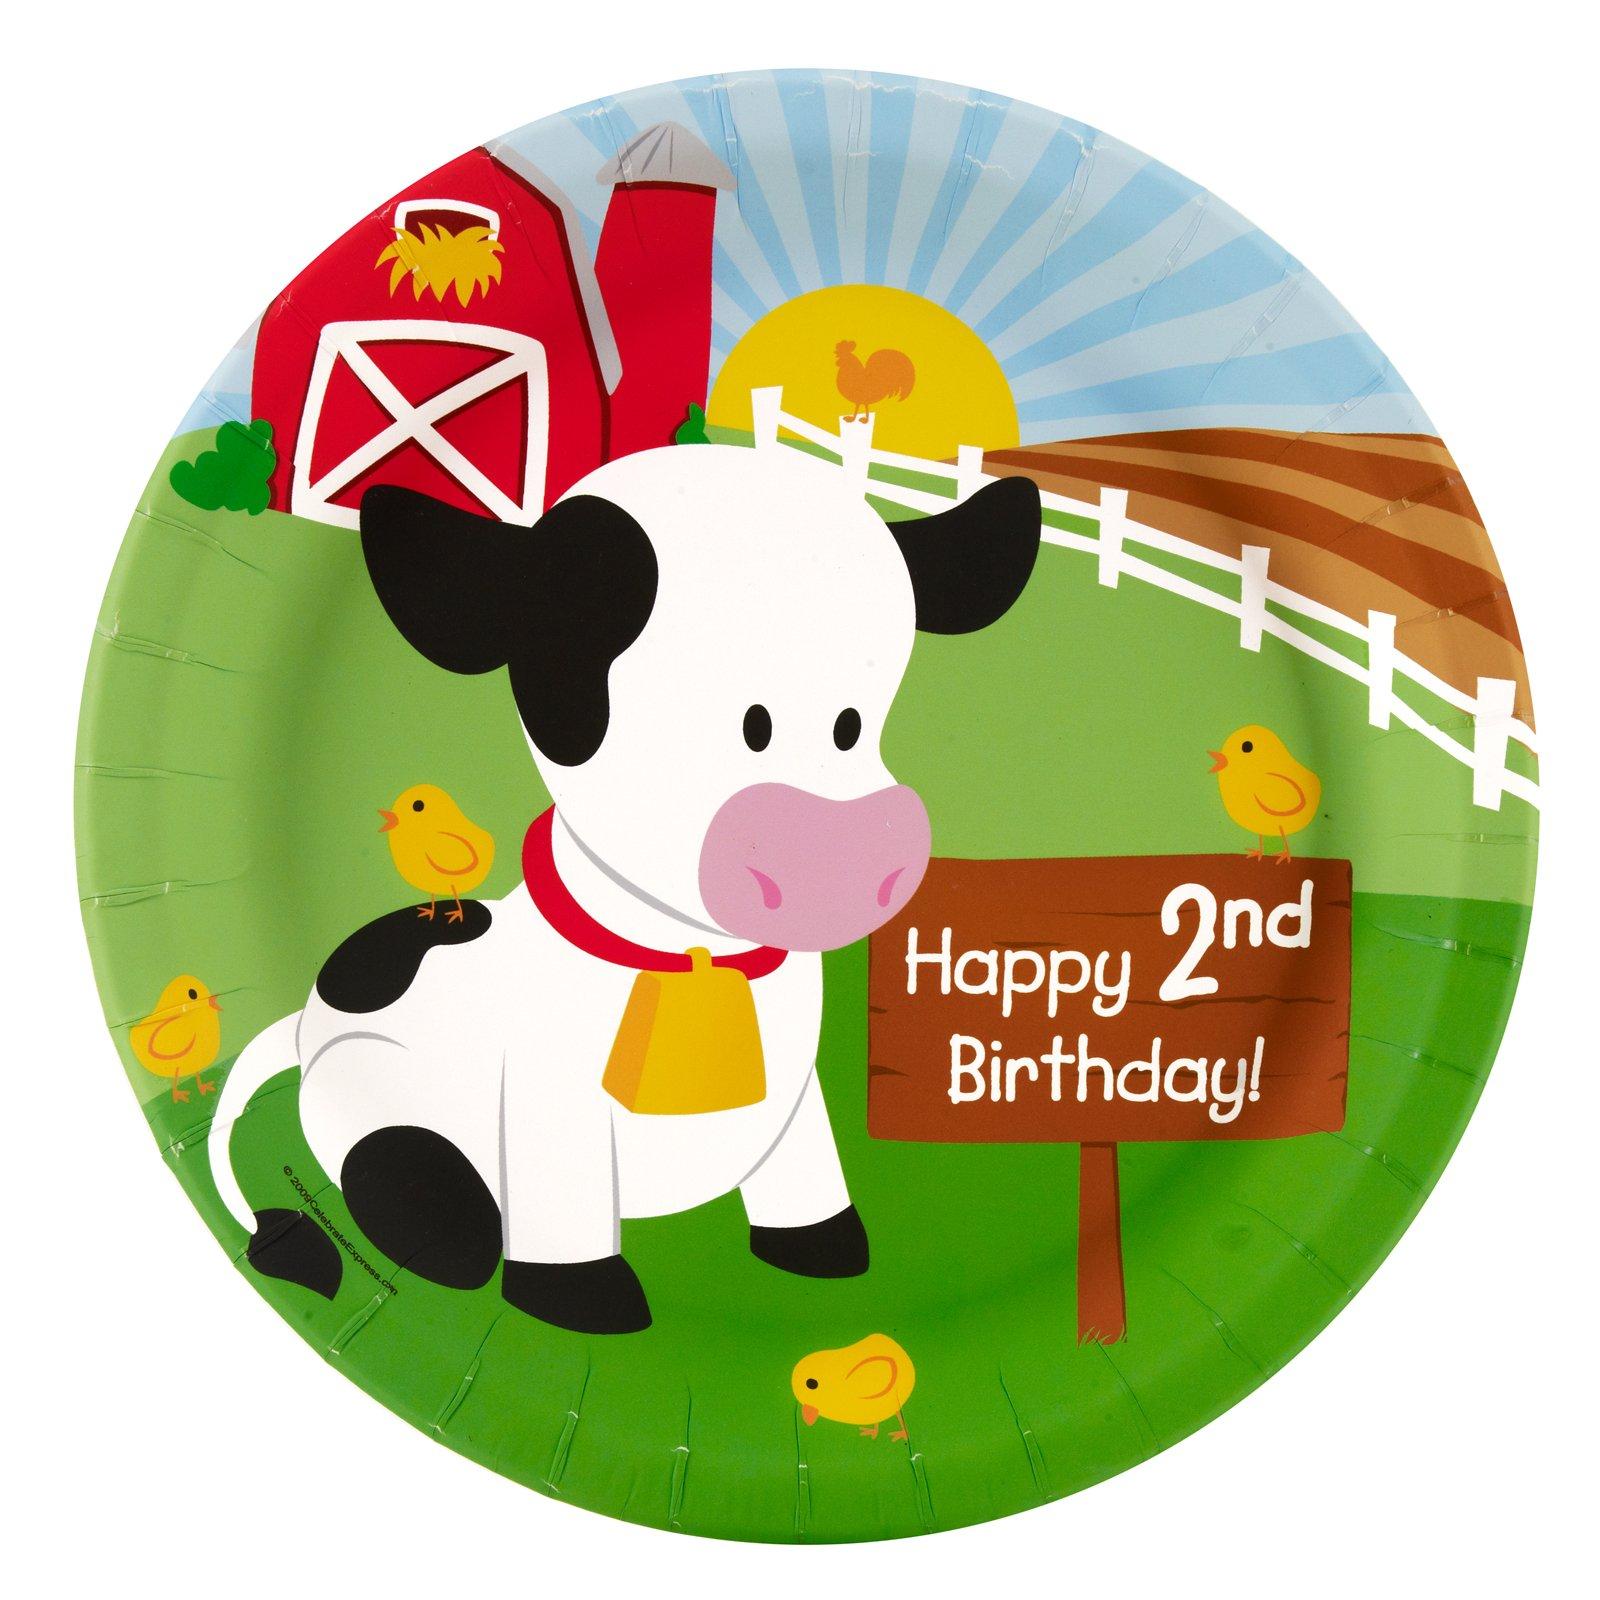 Farm Animal Party Supplies - 2nd Birthday Dinner Plates (8)